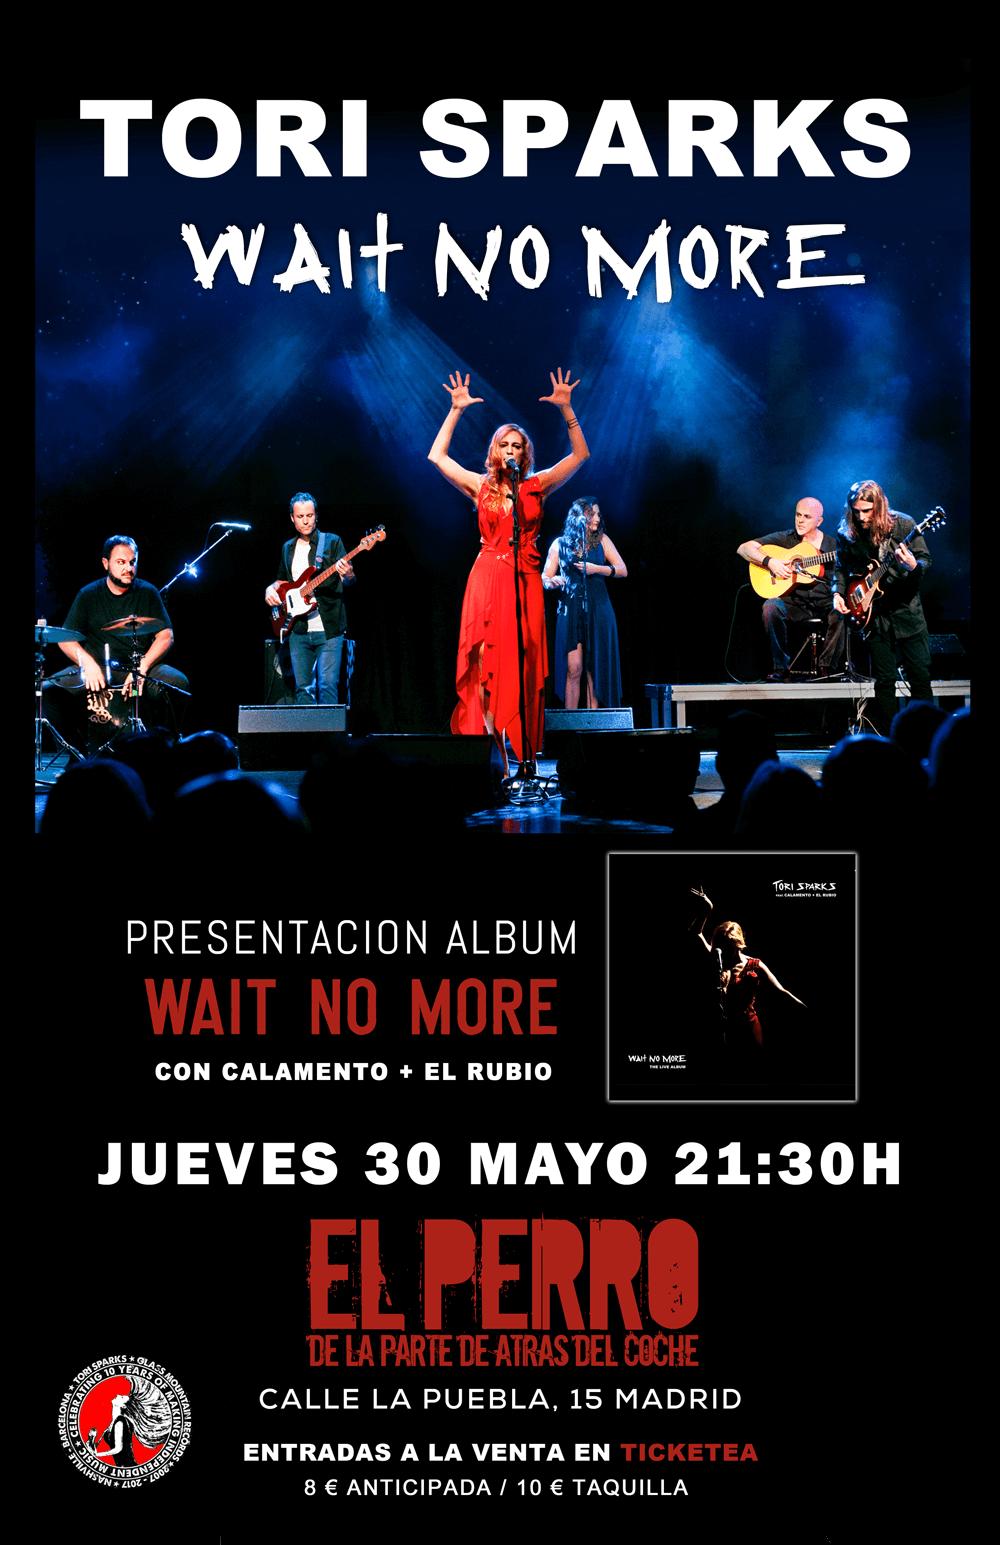 Tori-Sparks-Wait-No-More-Madrid-WEB.png